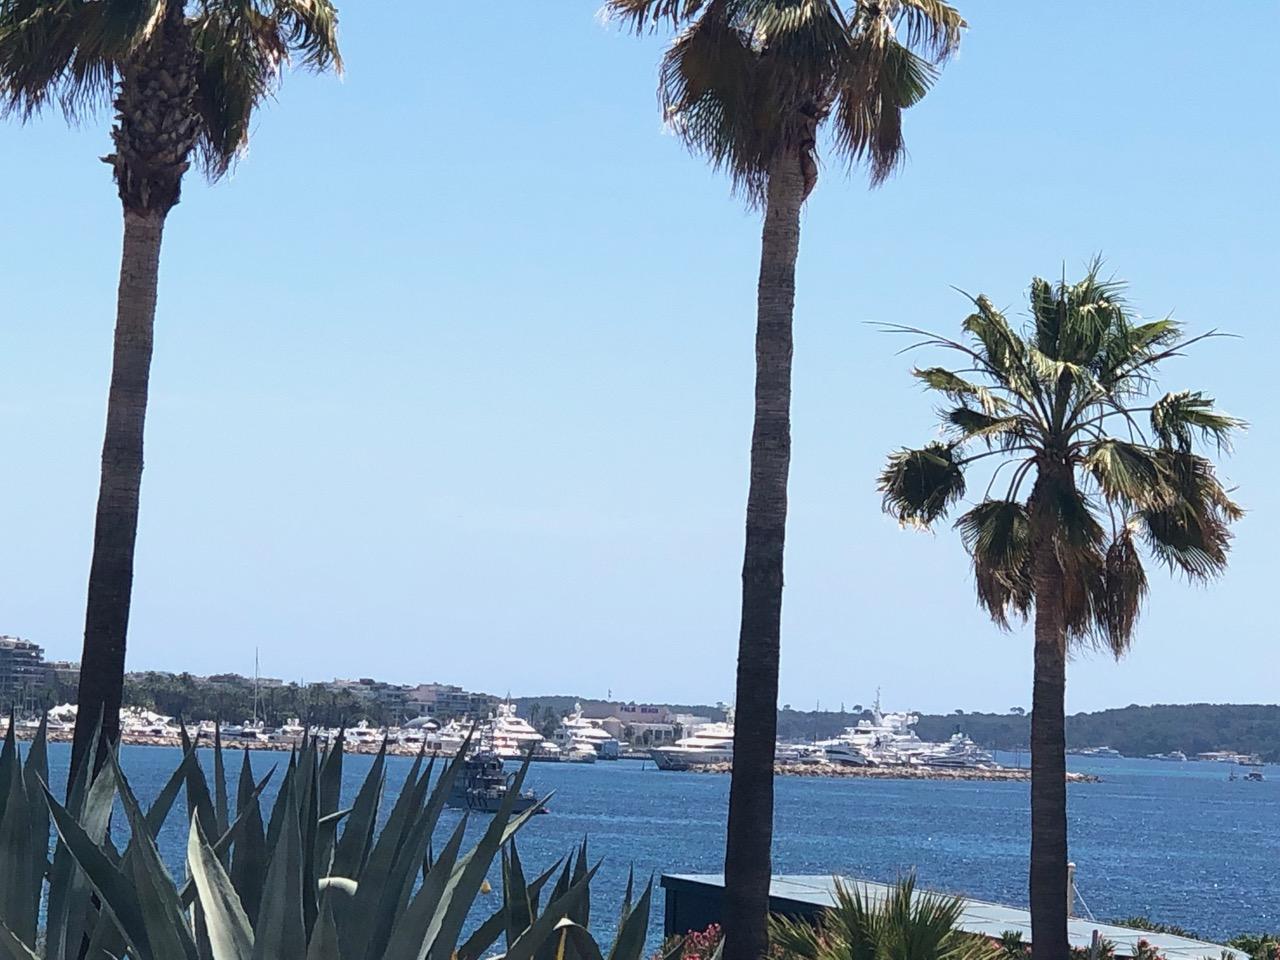 Fiona Leeming's Cannes Diary #1